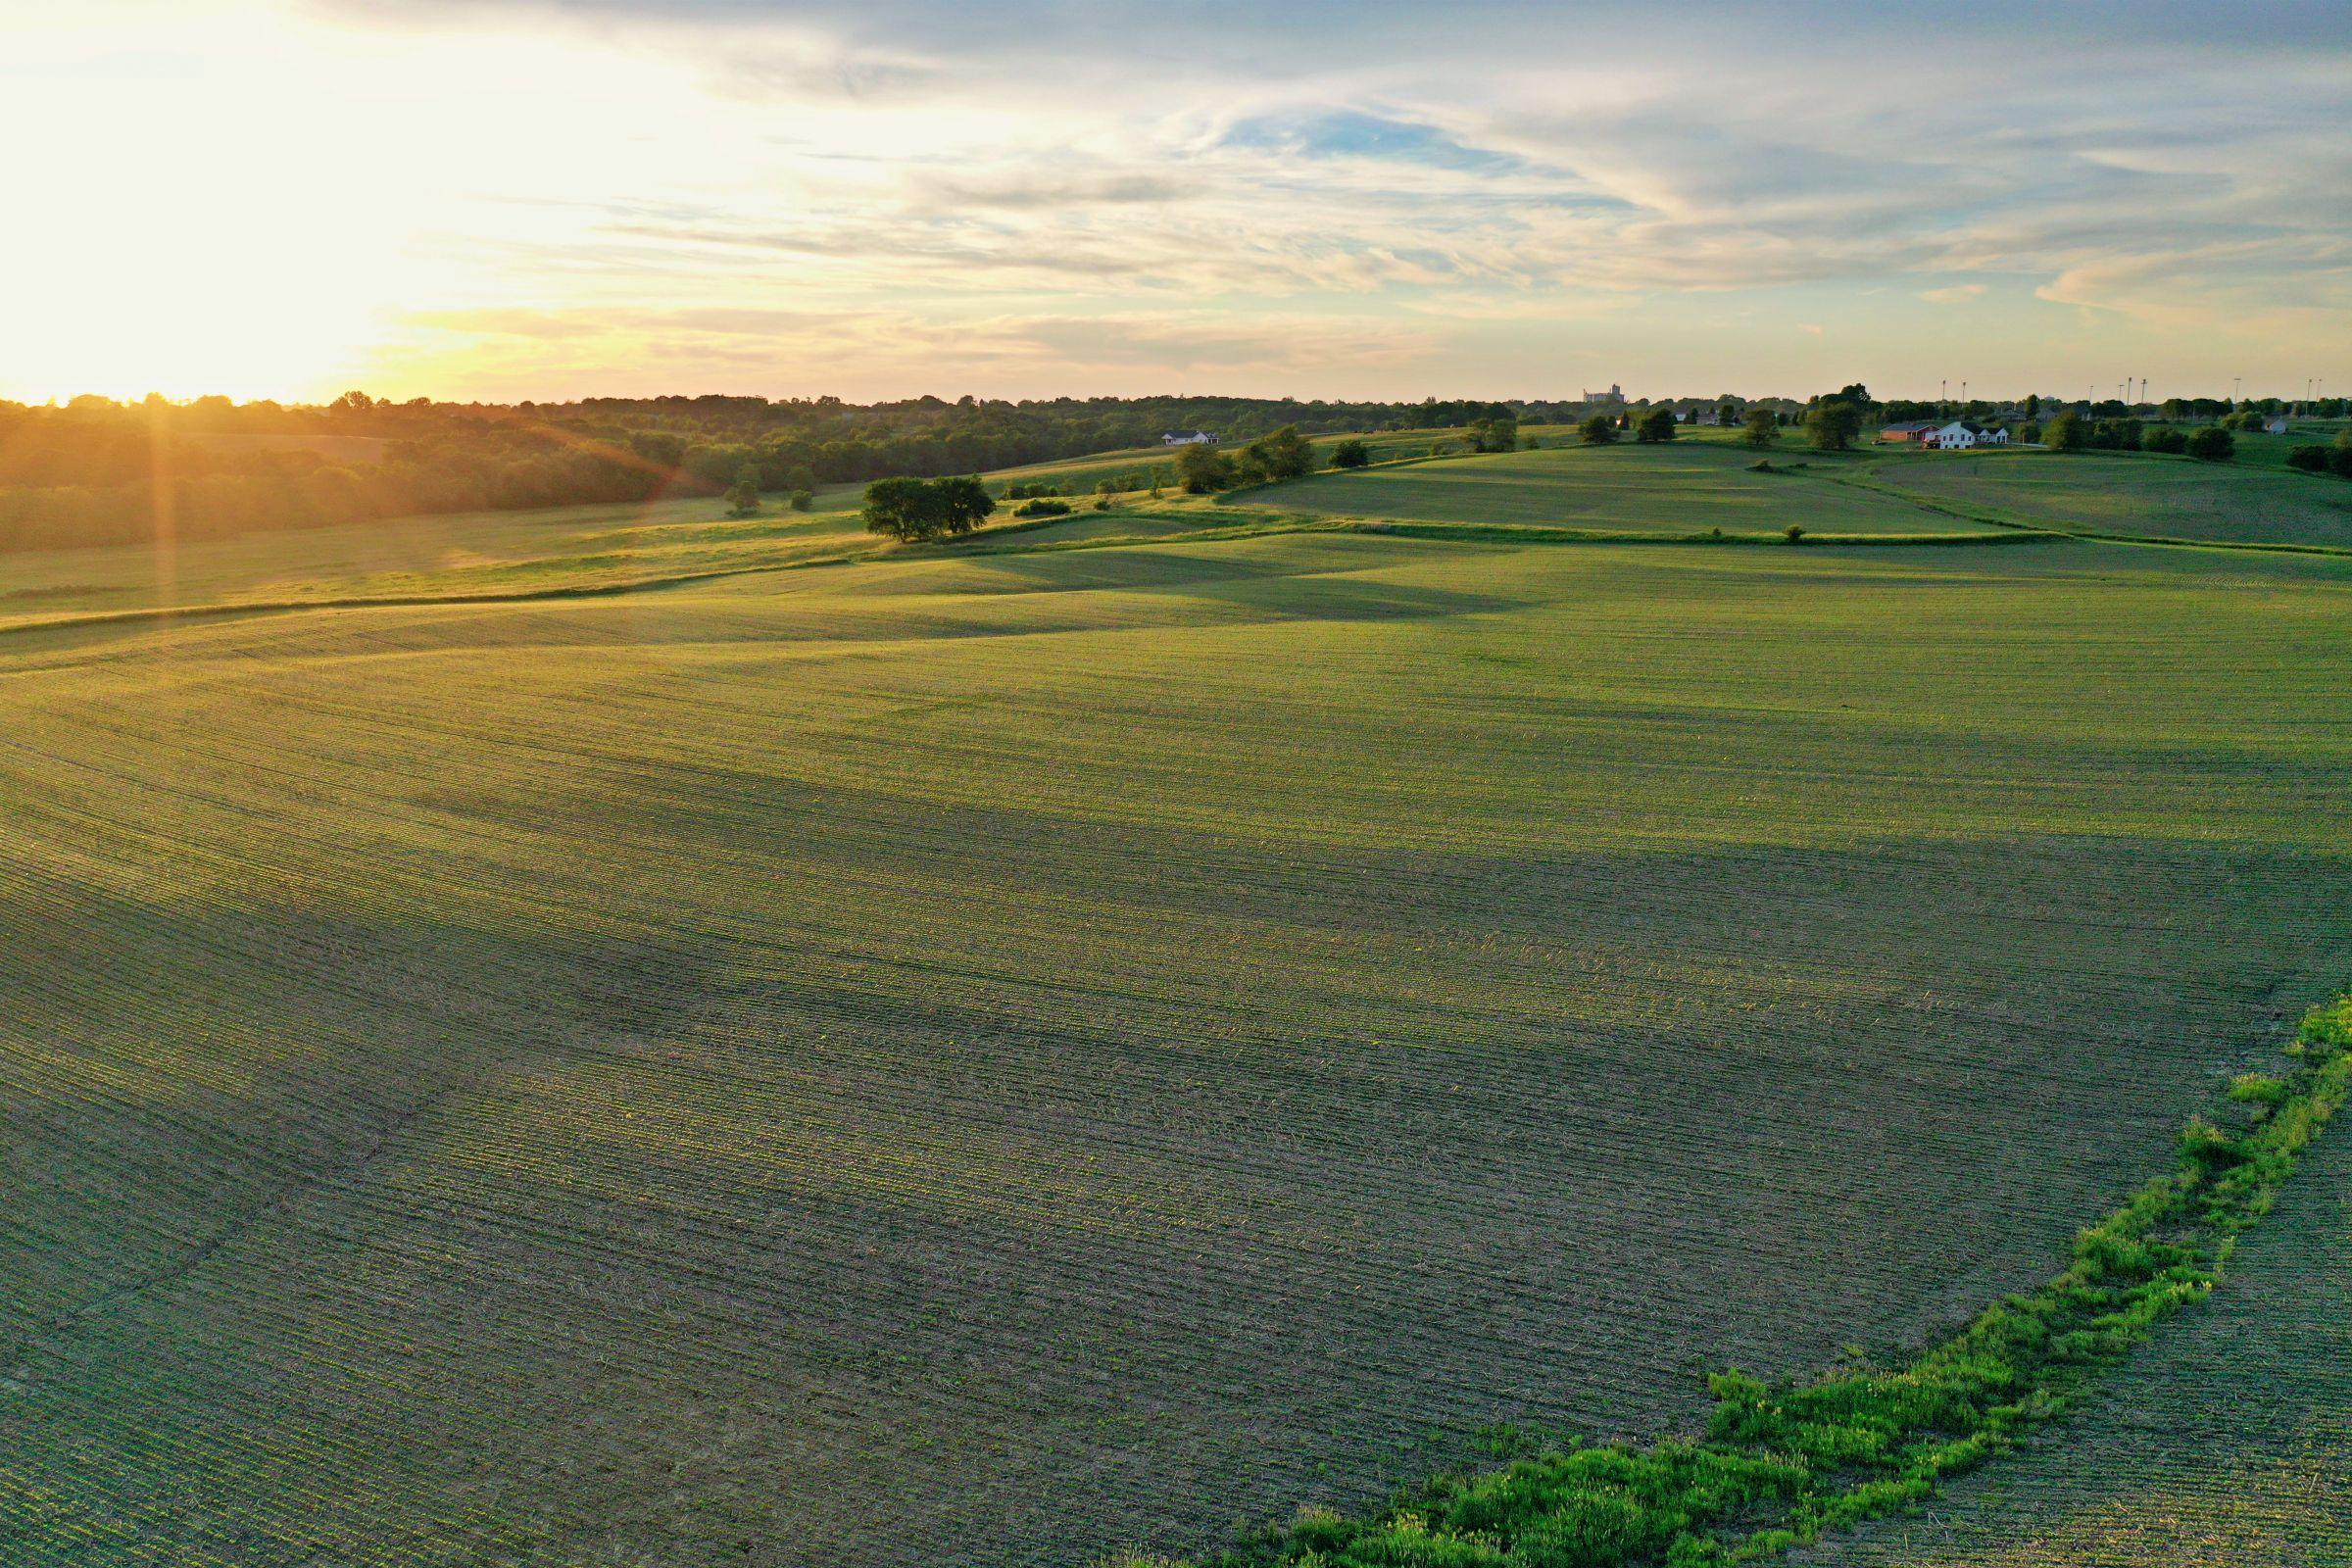 land-warren-county-iowa-80-acres-listing-number-15328-4-2021-01-25-192459.JPG